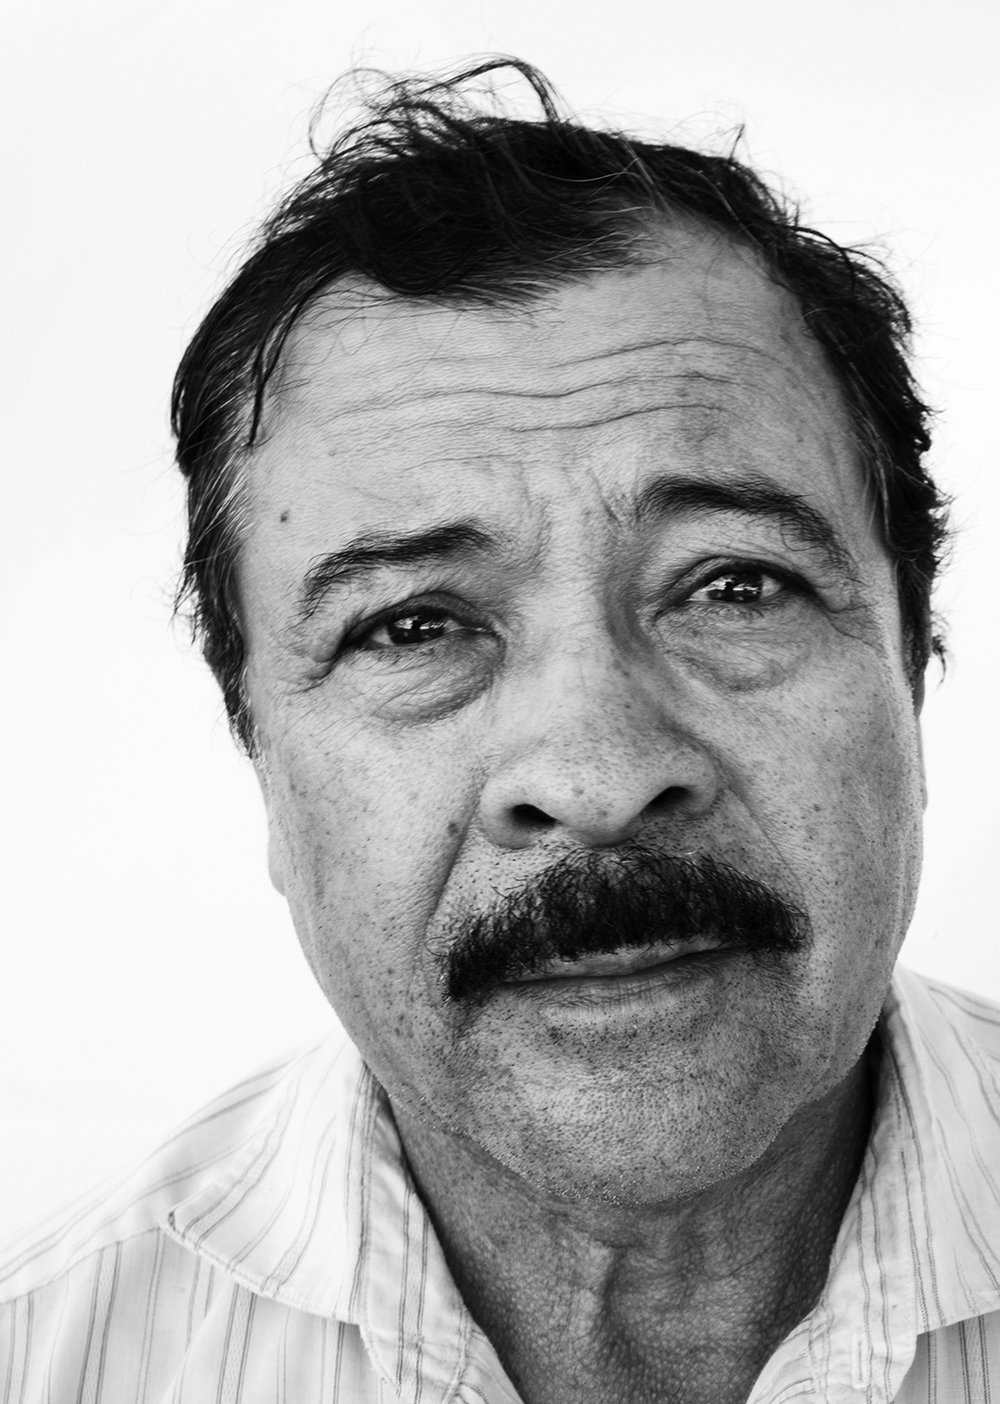 Jose Galaviz, 62, Nayarit, Mexico.